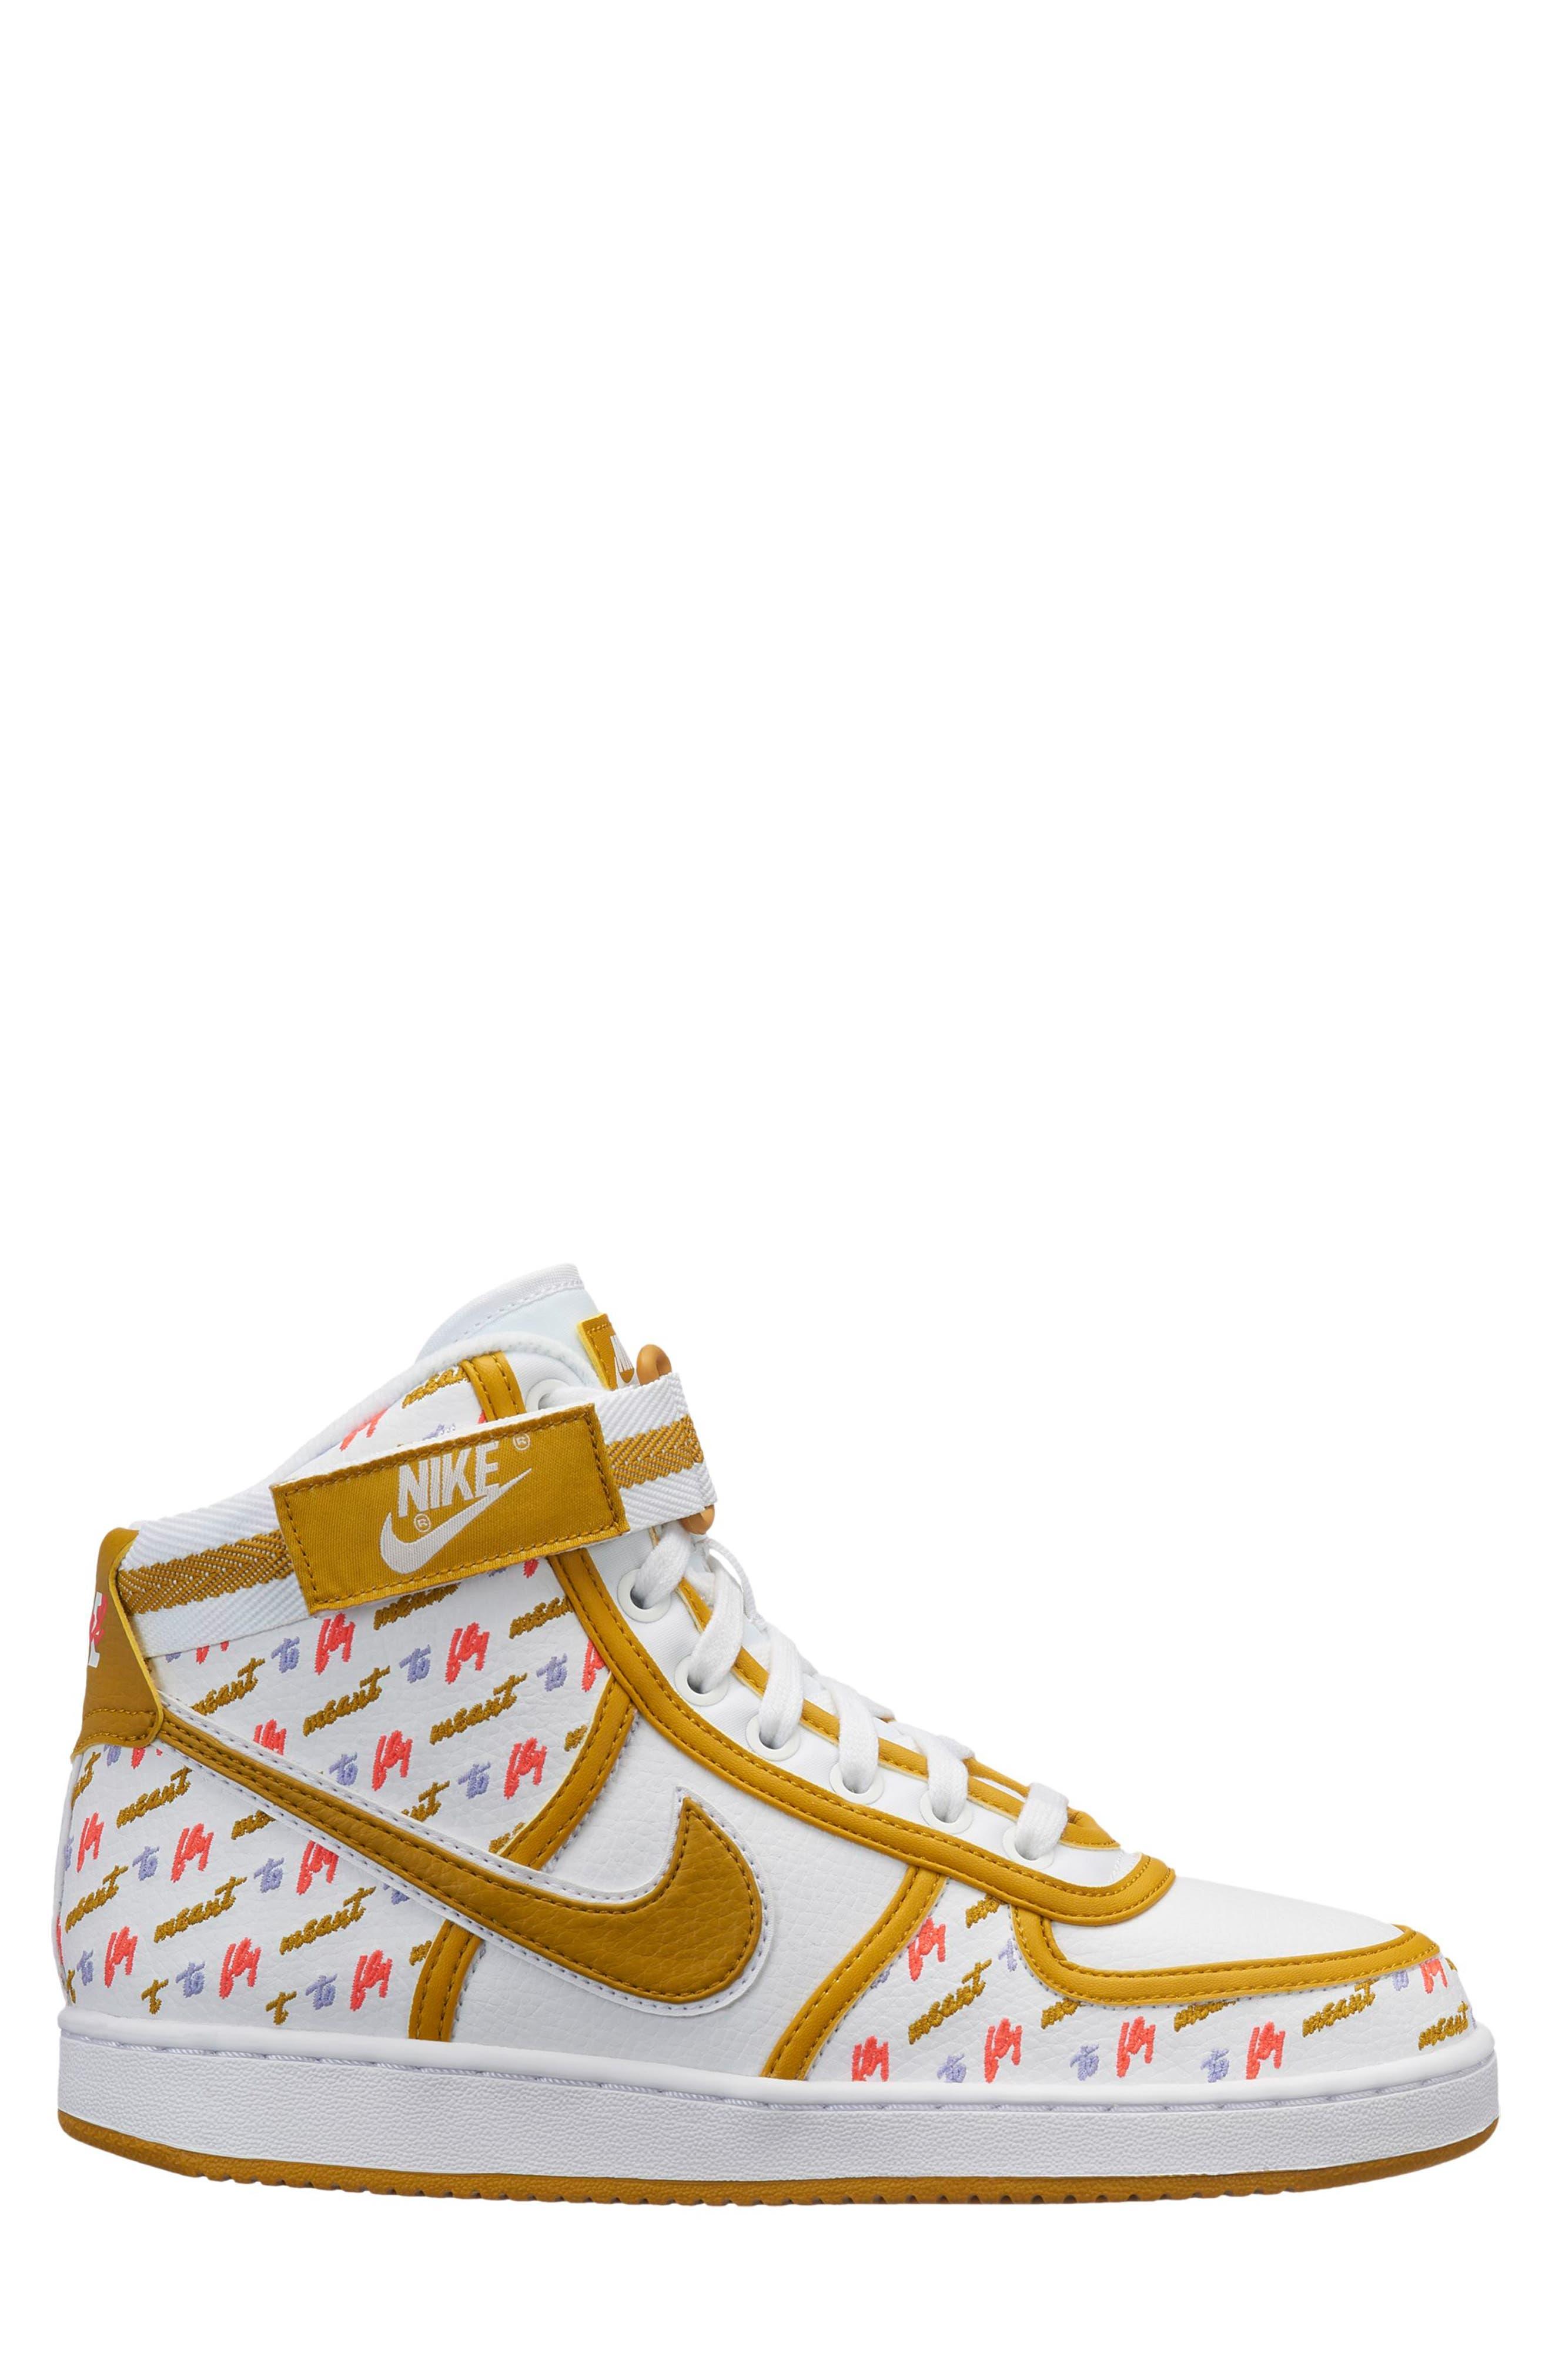 Vandal High Lux Sneaker,                             Main thumbnail 1, color,                             WHITE/ CITRON/ TWILIGHT PULSE